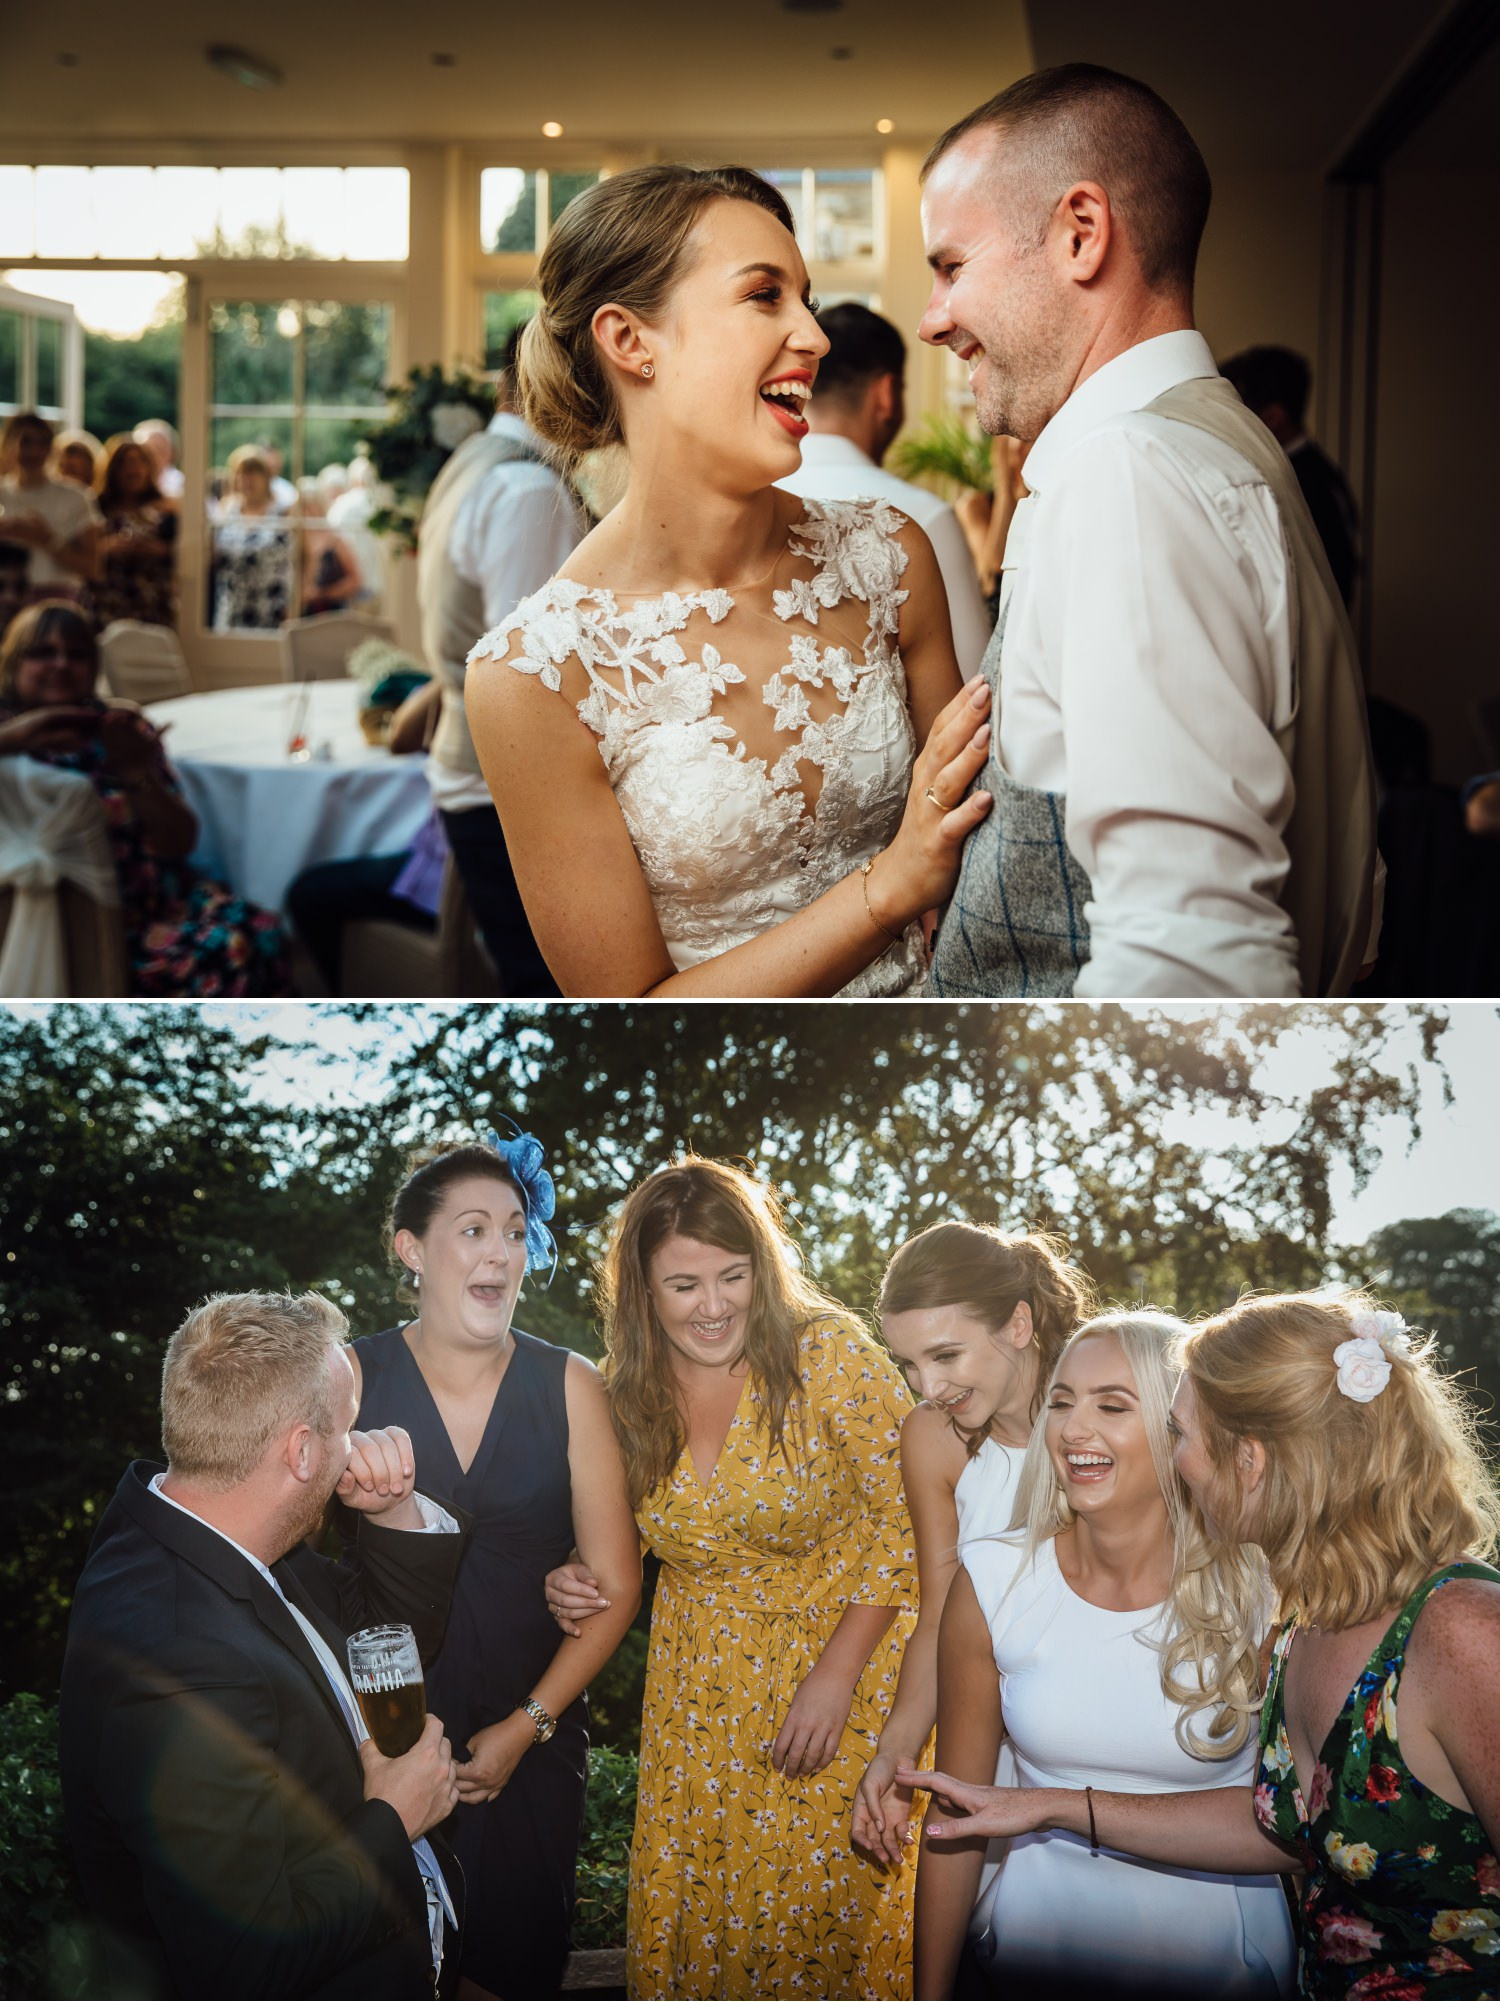 Wedding photographers Mitton Hall